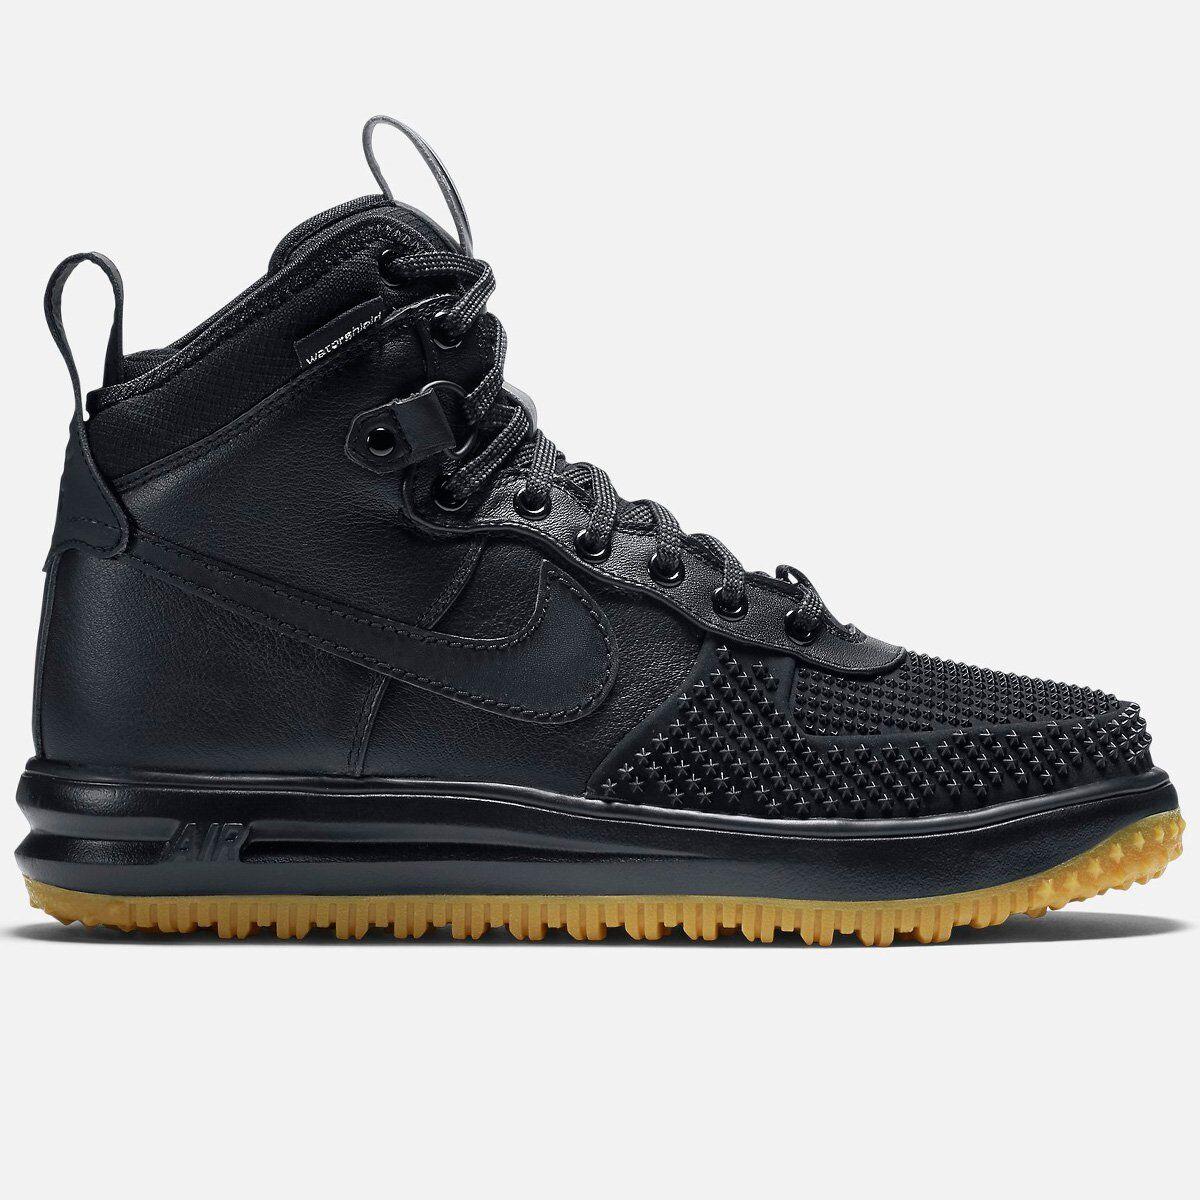 Nike Lunar Air Force 1 LF1 10 12 13 Duckboot Black Silver Gum QS One 805899 003